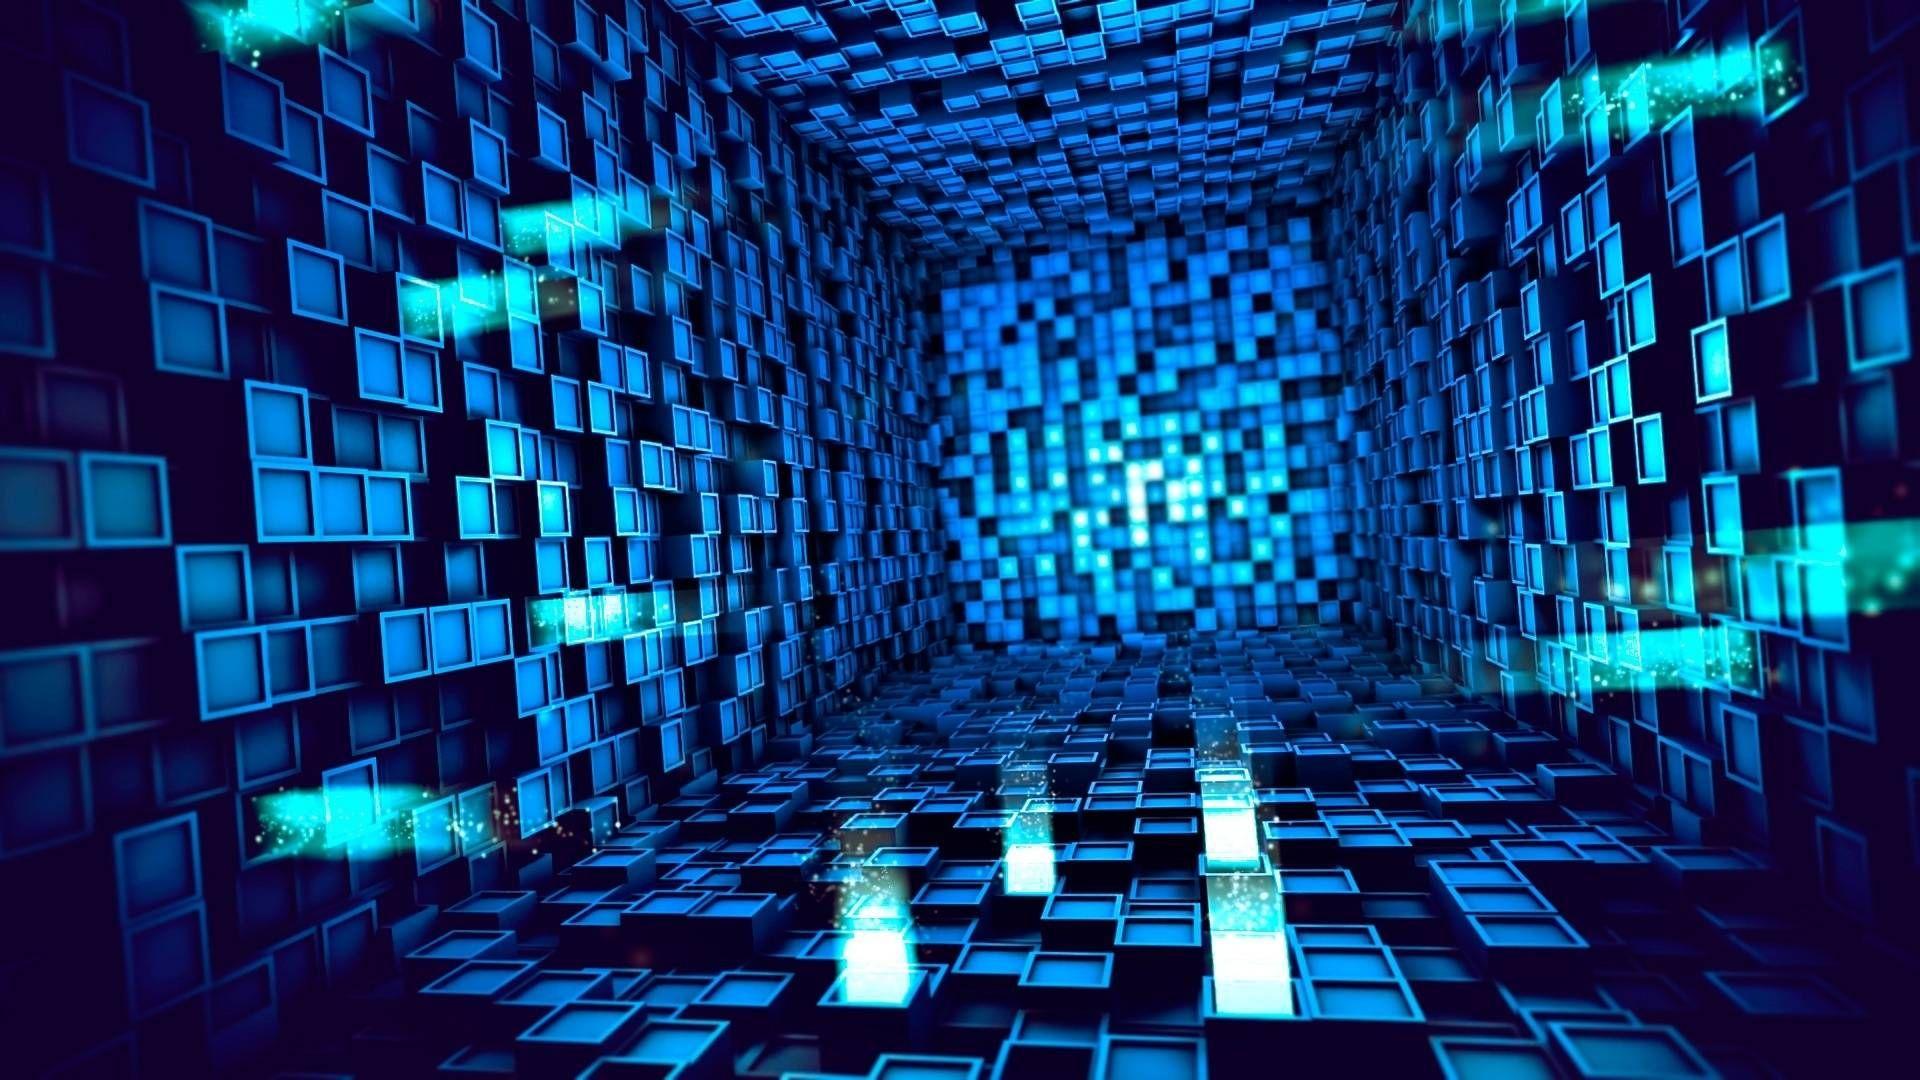 hd cube wallpaper a· free wallpaper appshd